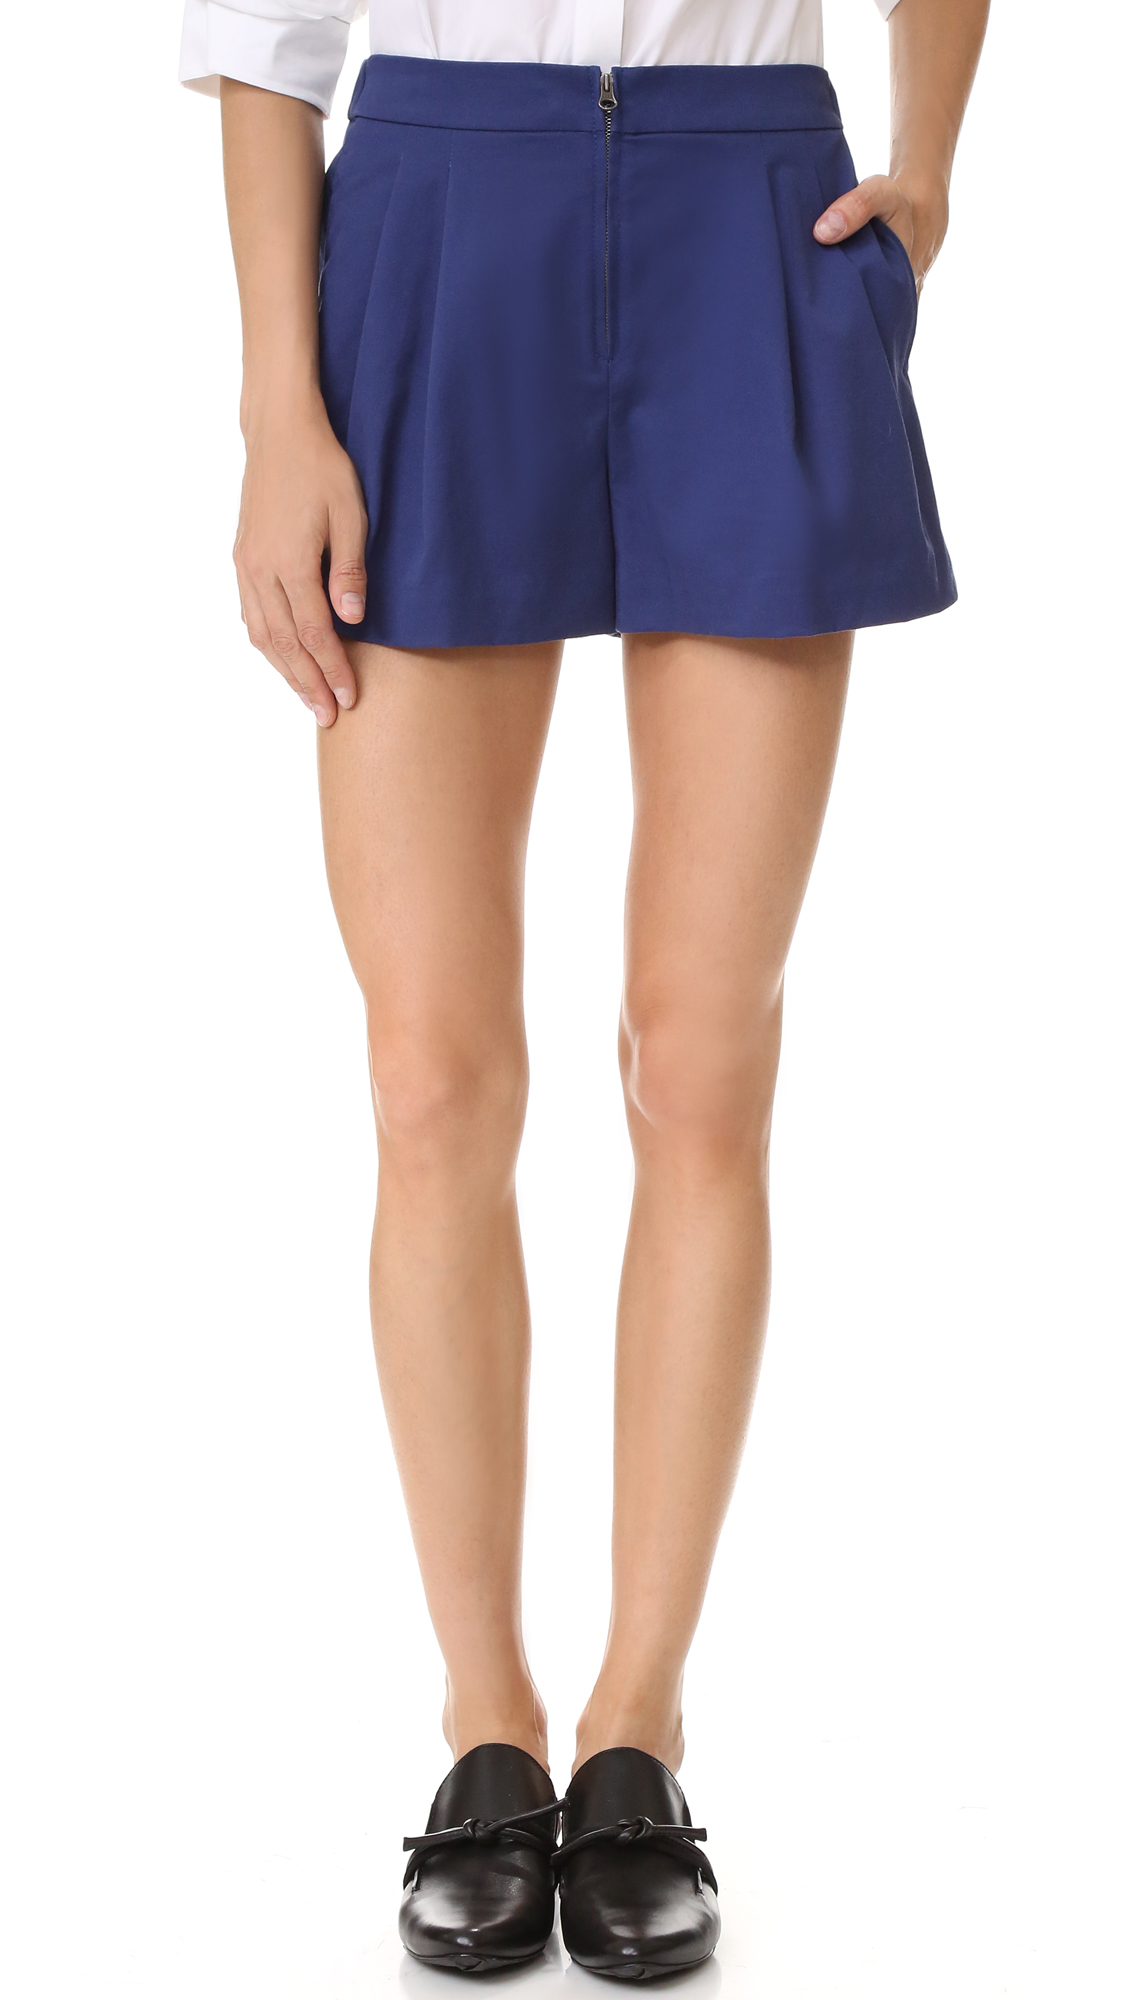 31 phillip lim female 31 phillip lim bloomer shorts ultramarine